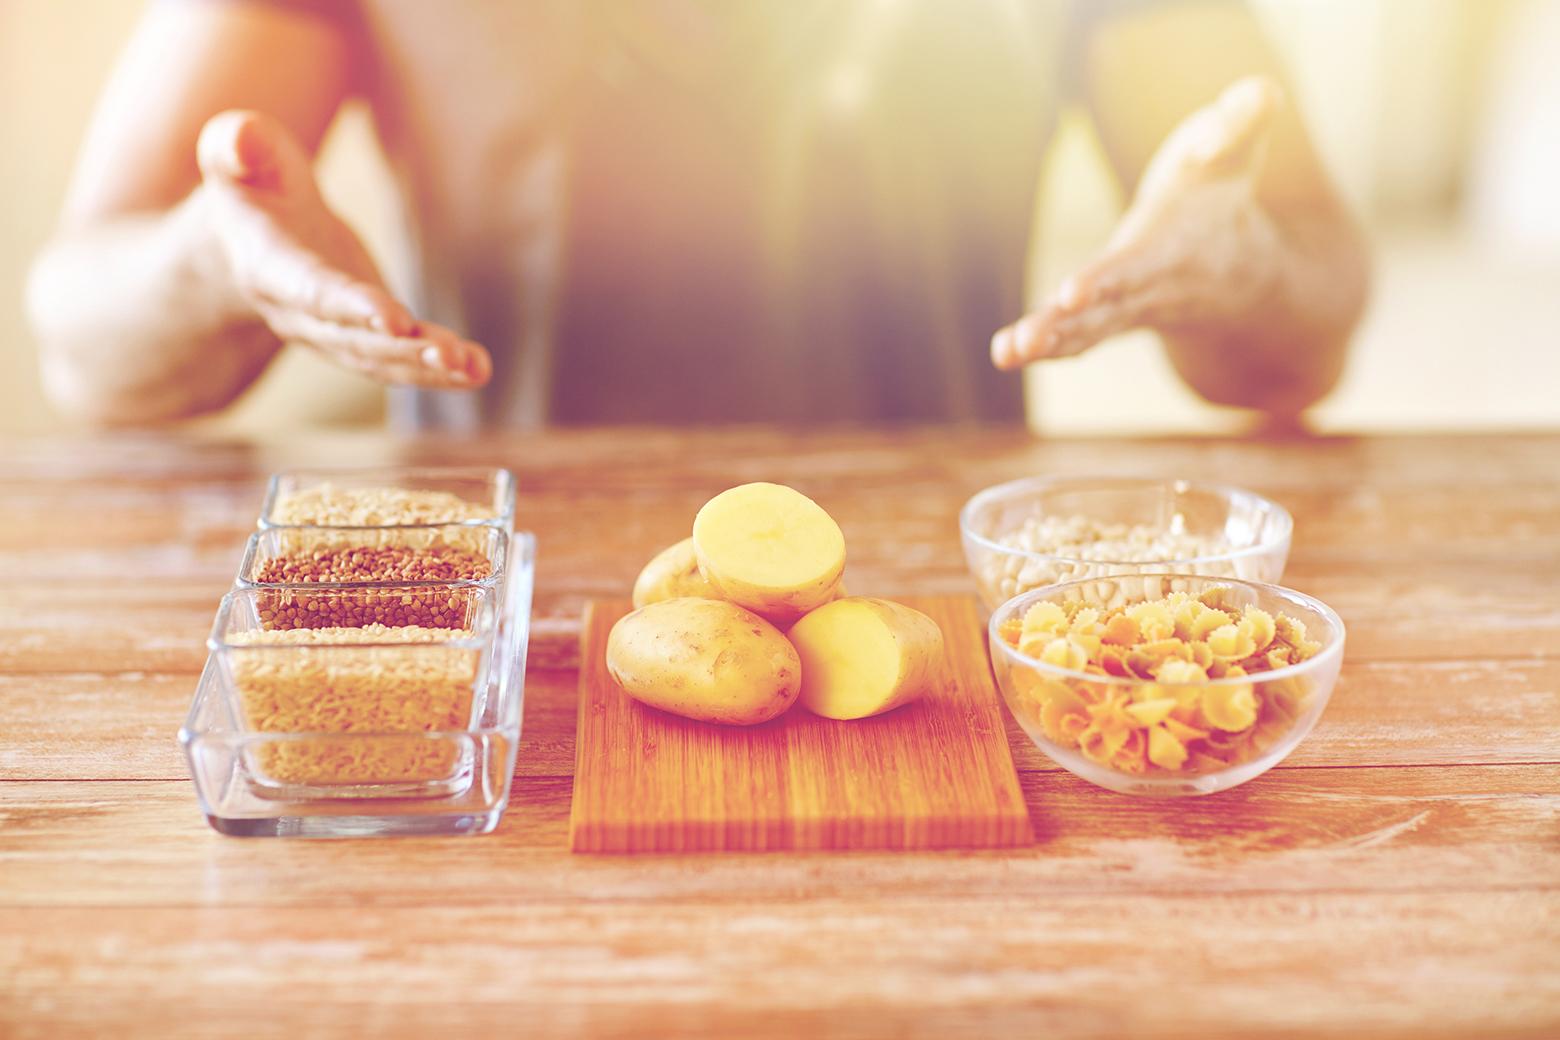 Ulike karbohydrater